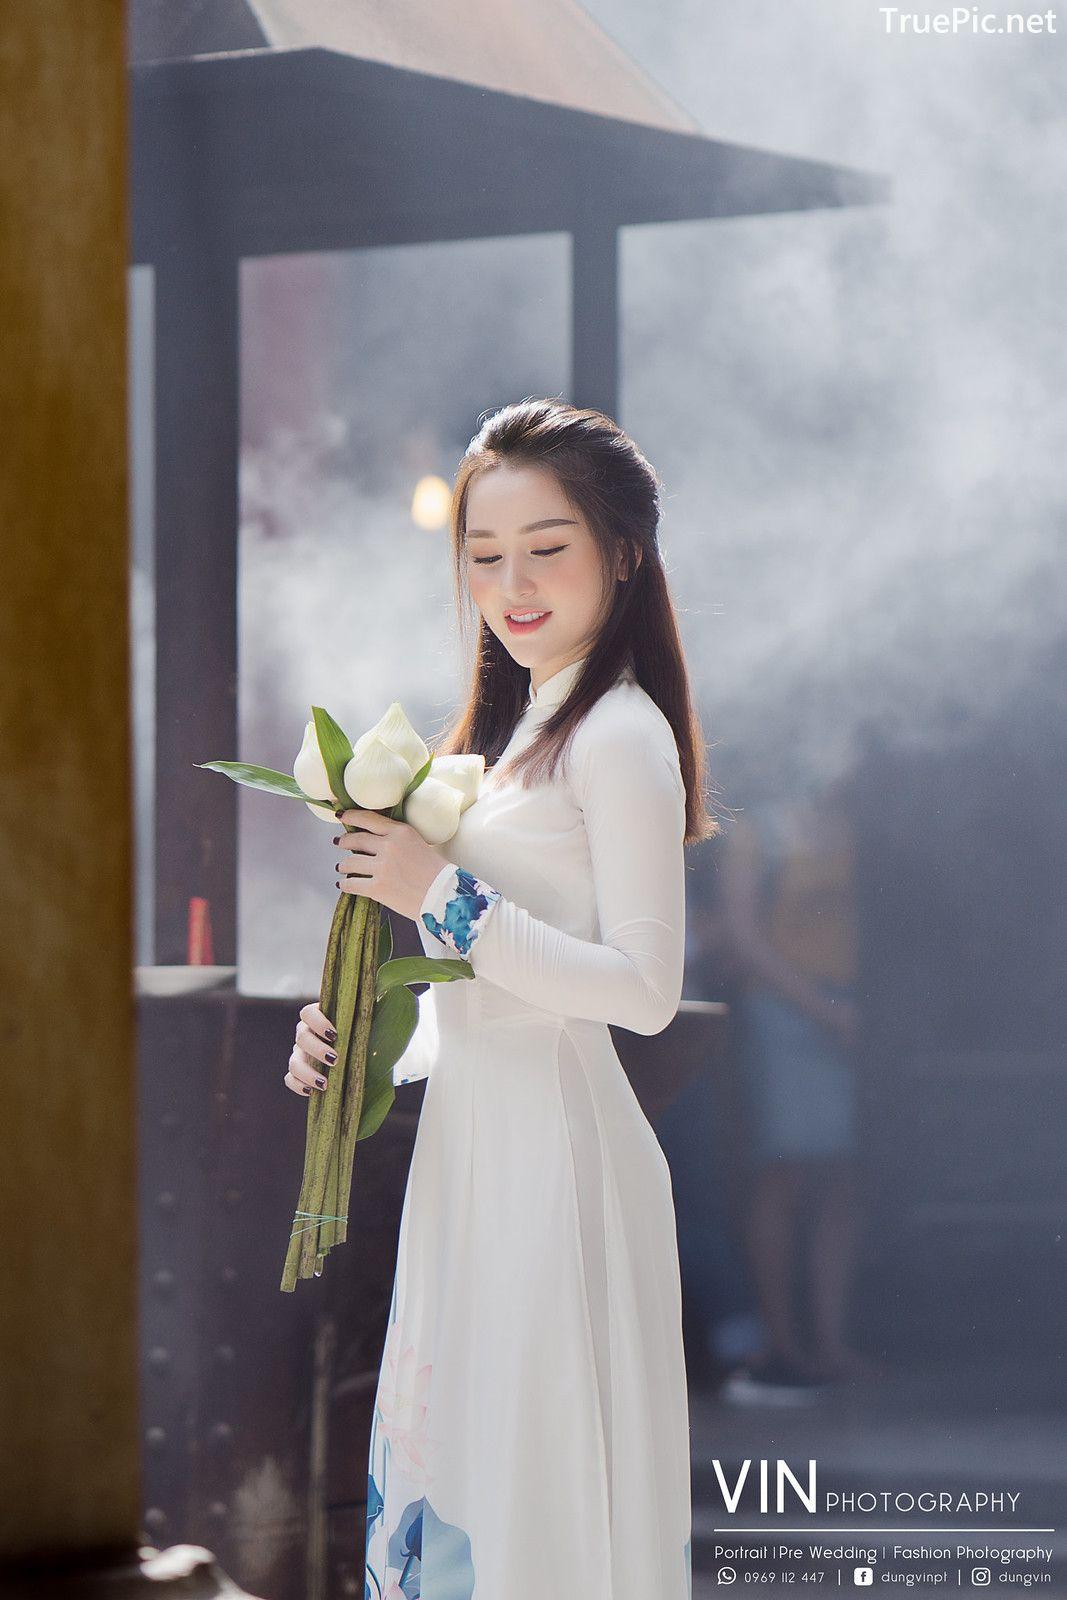 Image-Vietnamese-Beautiful-Girl-Ao-Dai-Vietnam-Traditional-Dress-by-VIN-Photo-1-TruePic.net- Picture-4